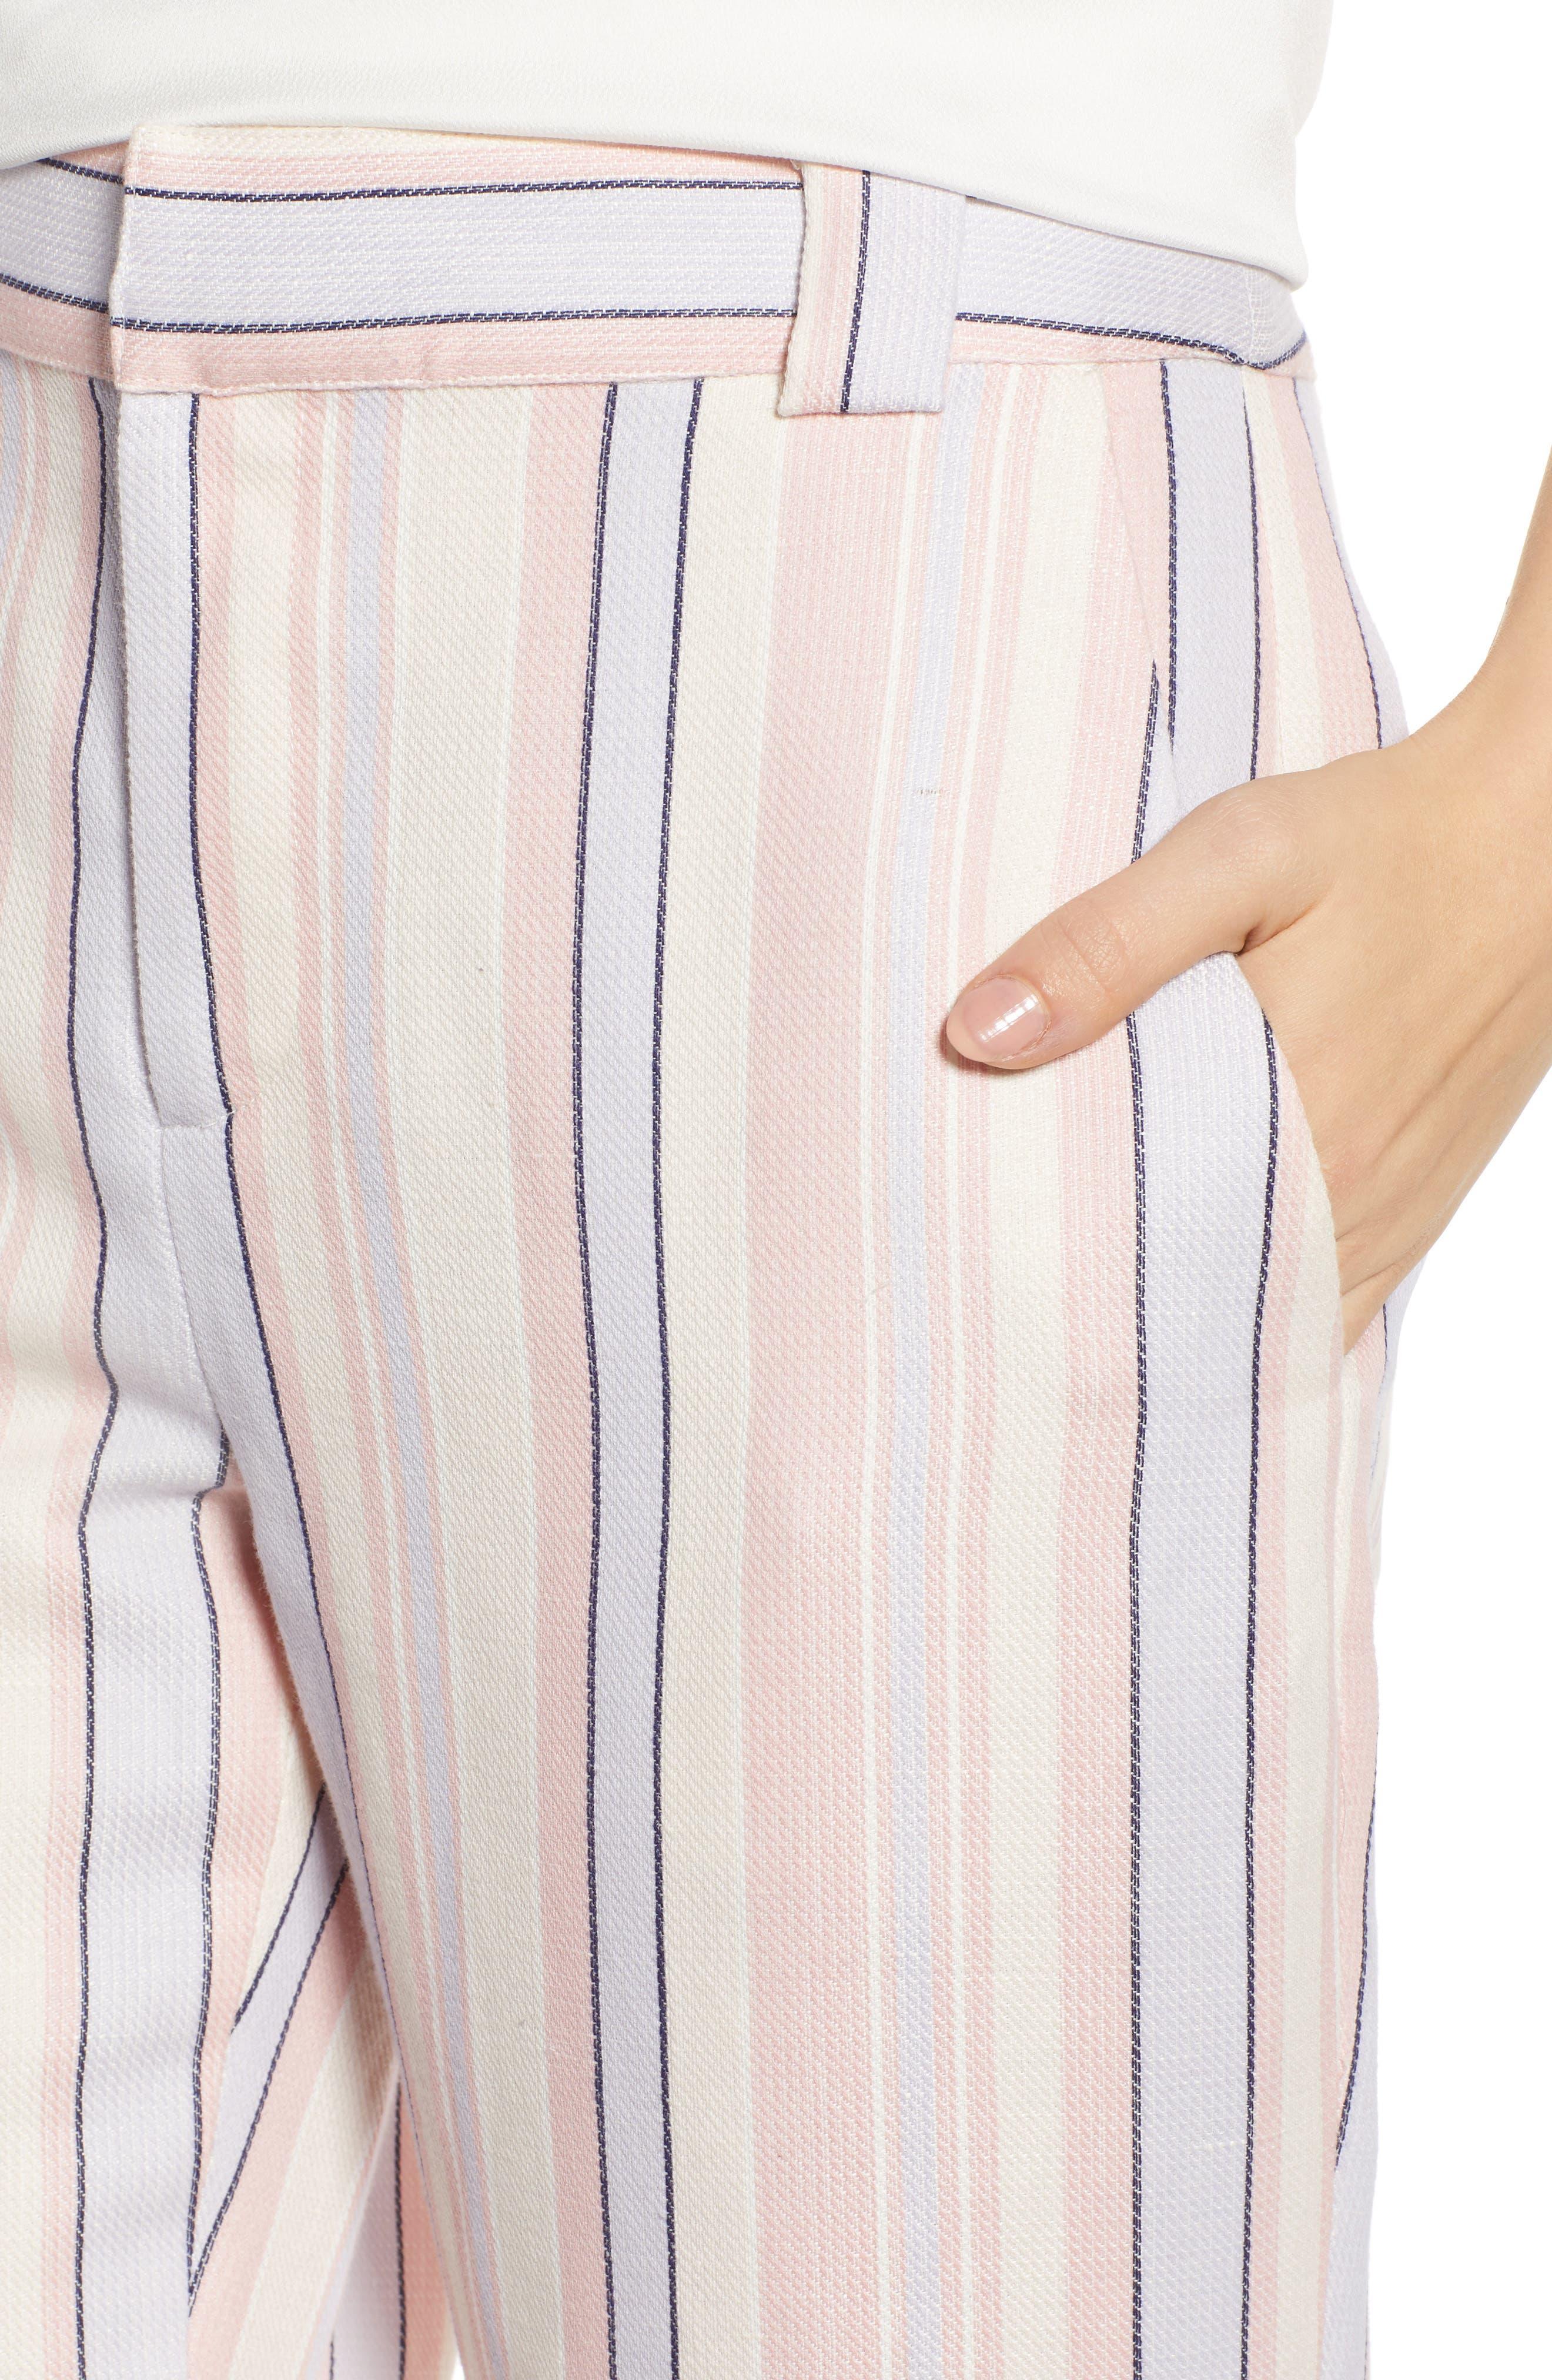 Ginger Stripe Pants,                             Alternate thumbnail 4, color,                             MULTI